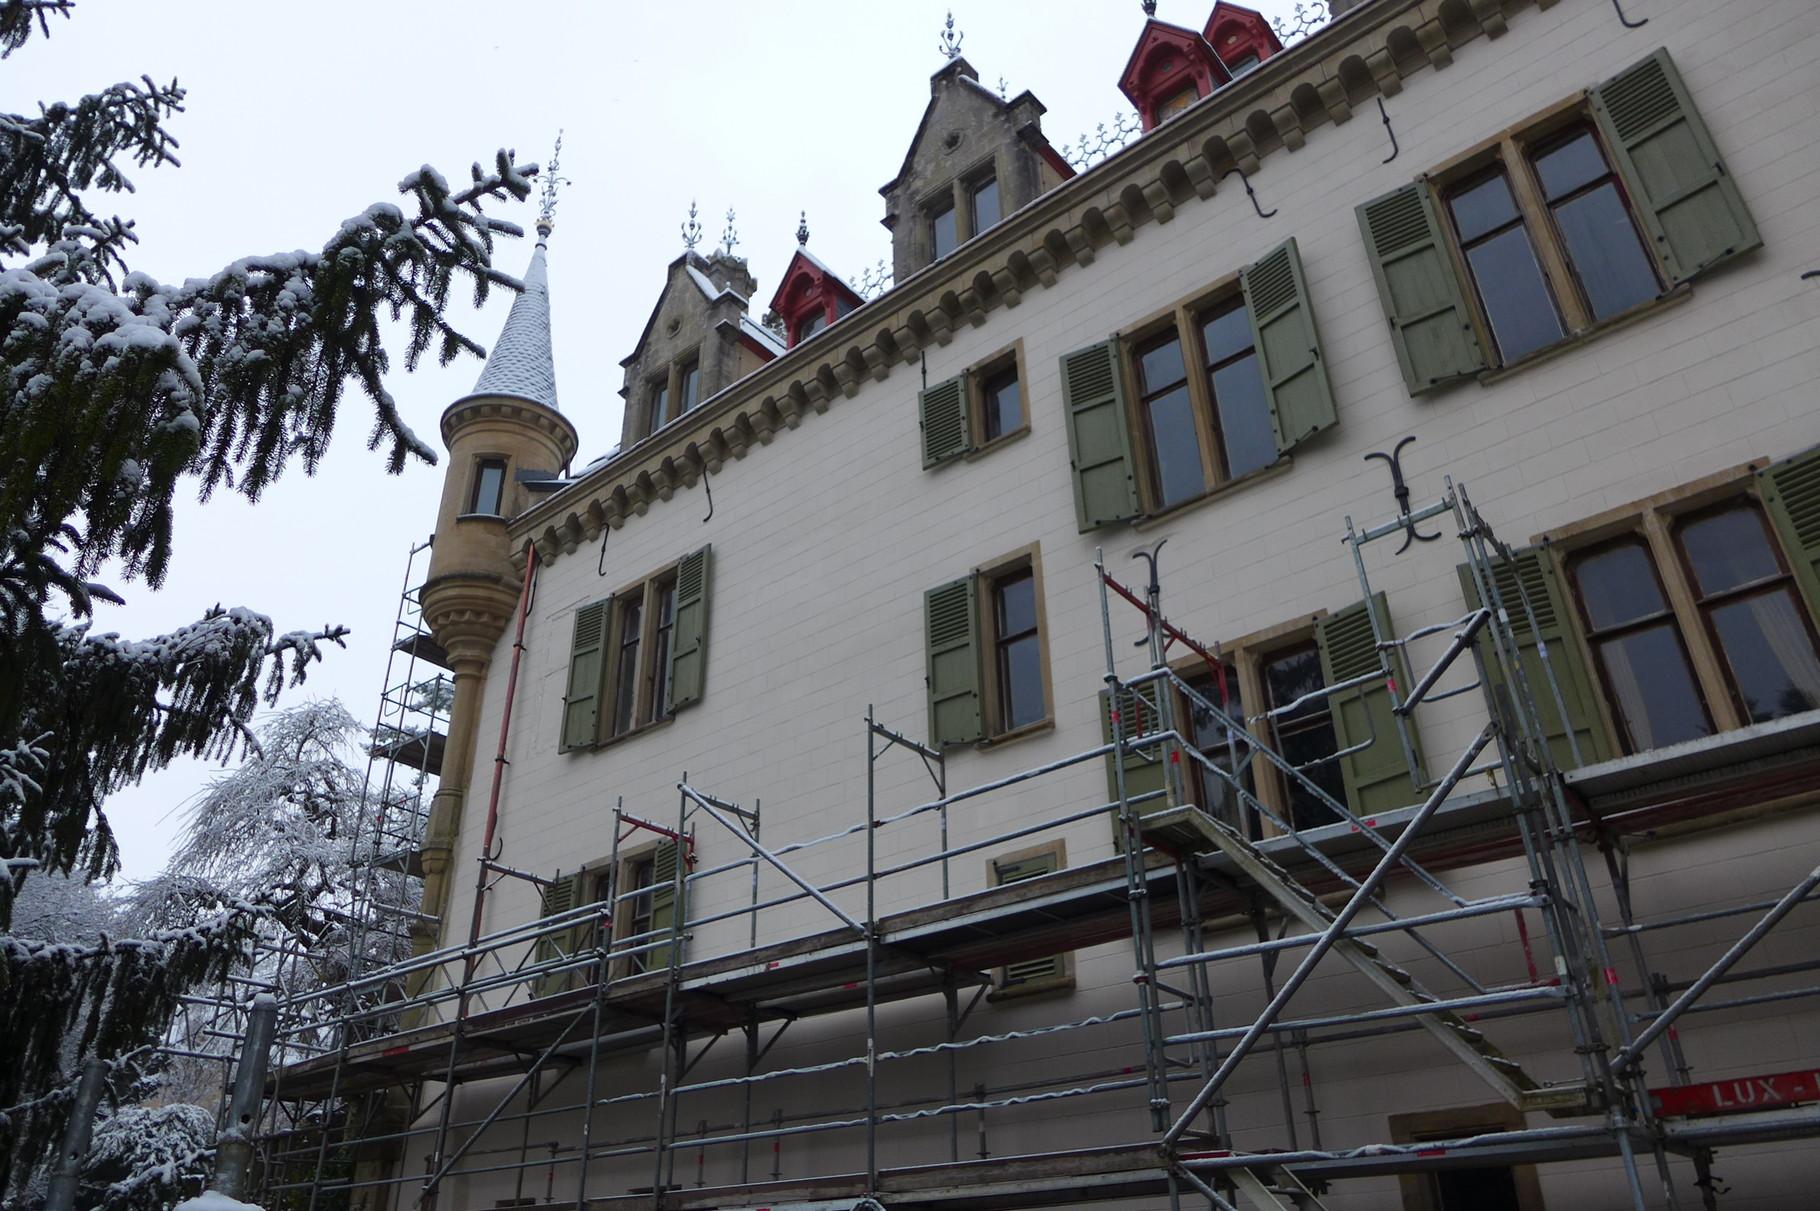 Schloss Meysembourg, Luxembourg